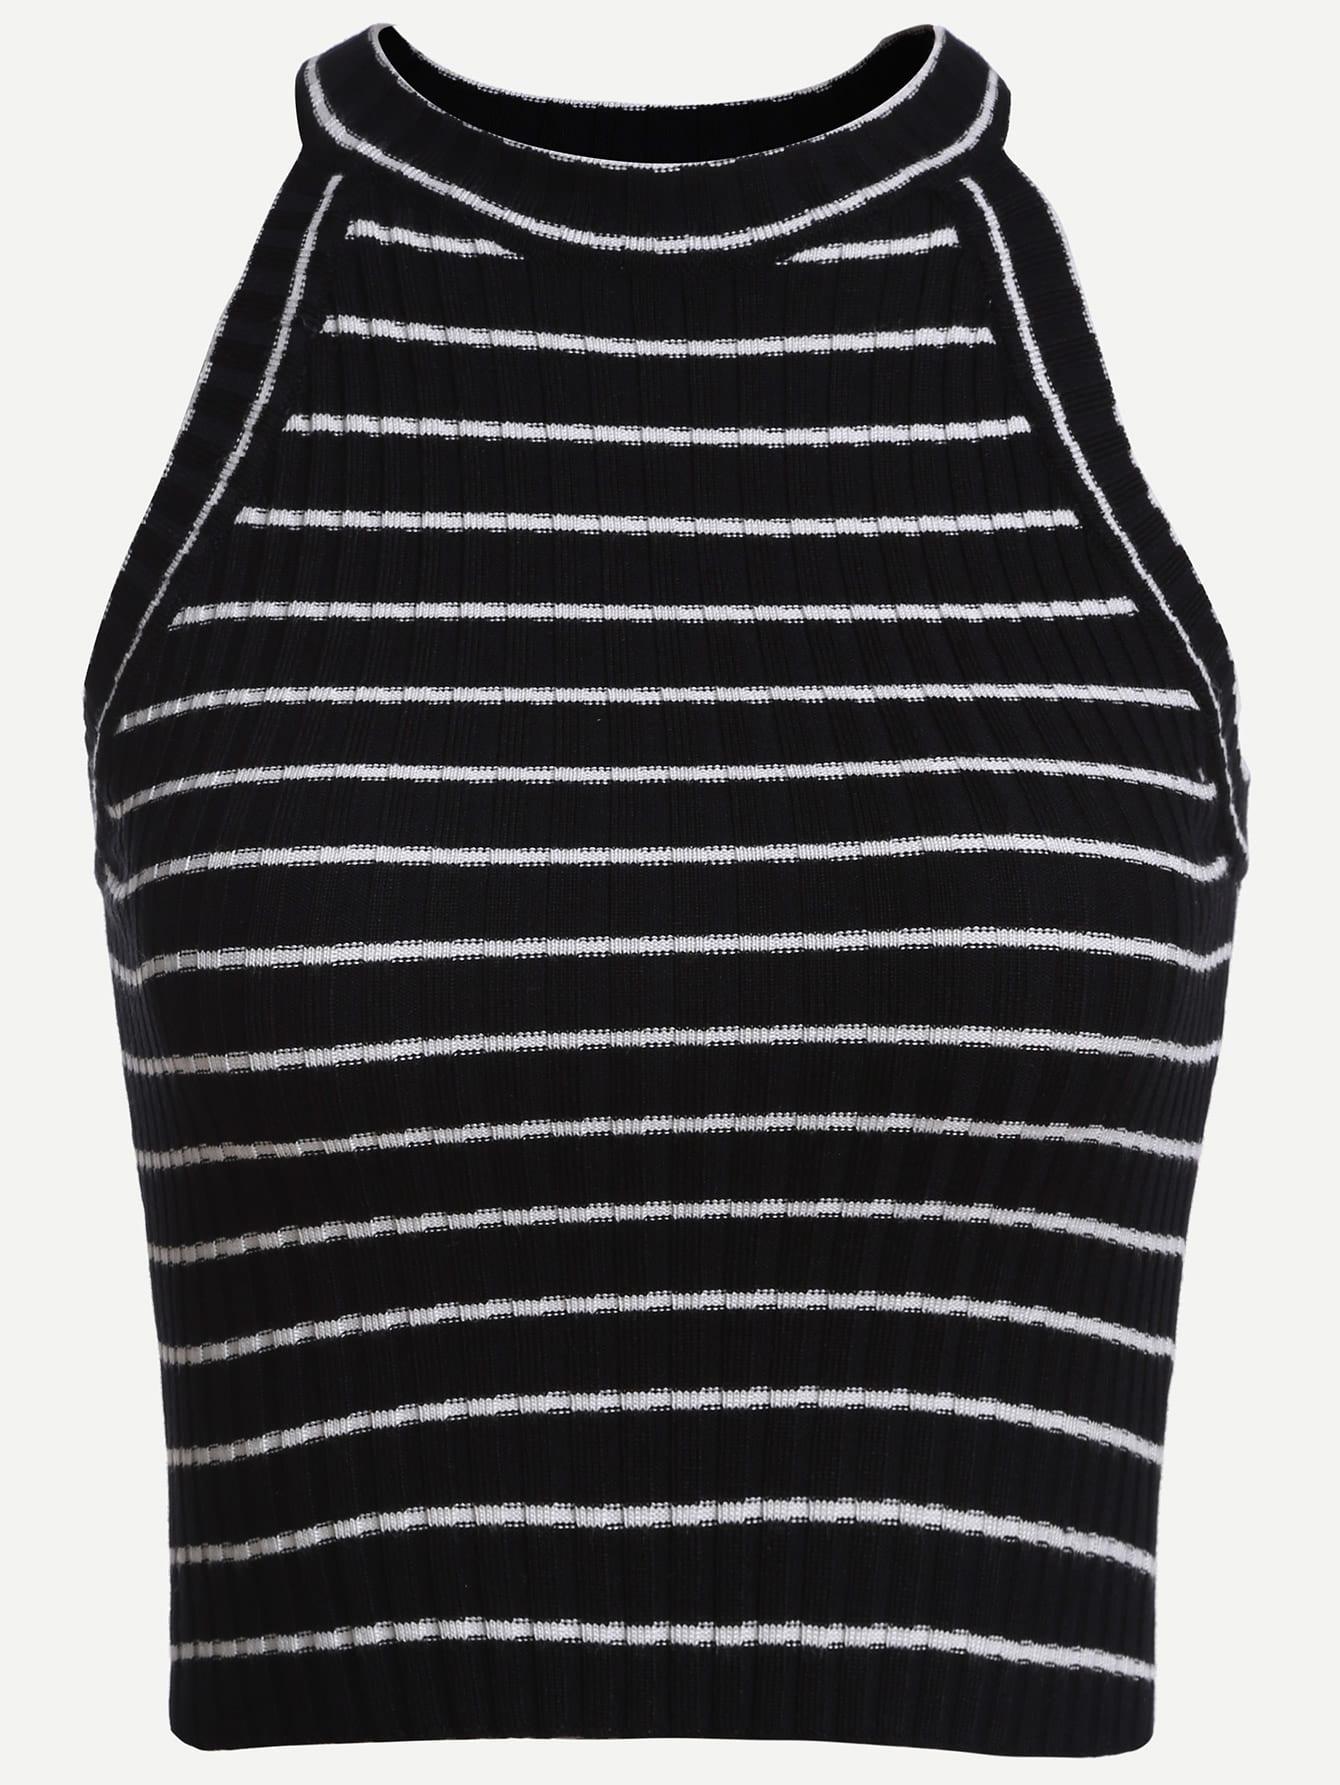 Black Striped Ribbed Knit Halter Neck Top vest160714021